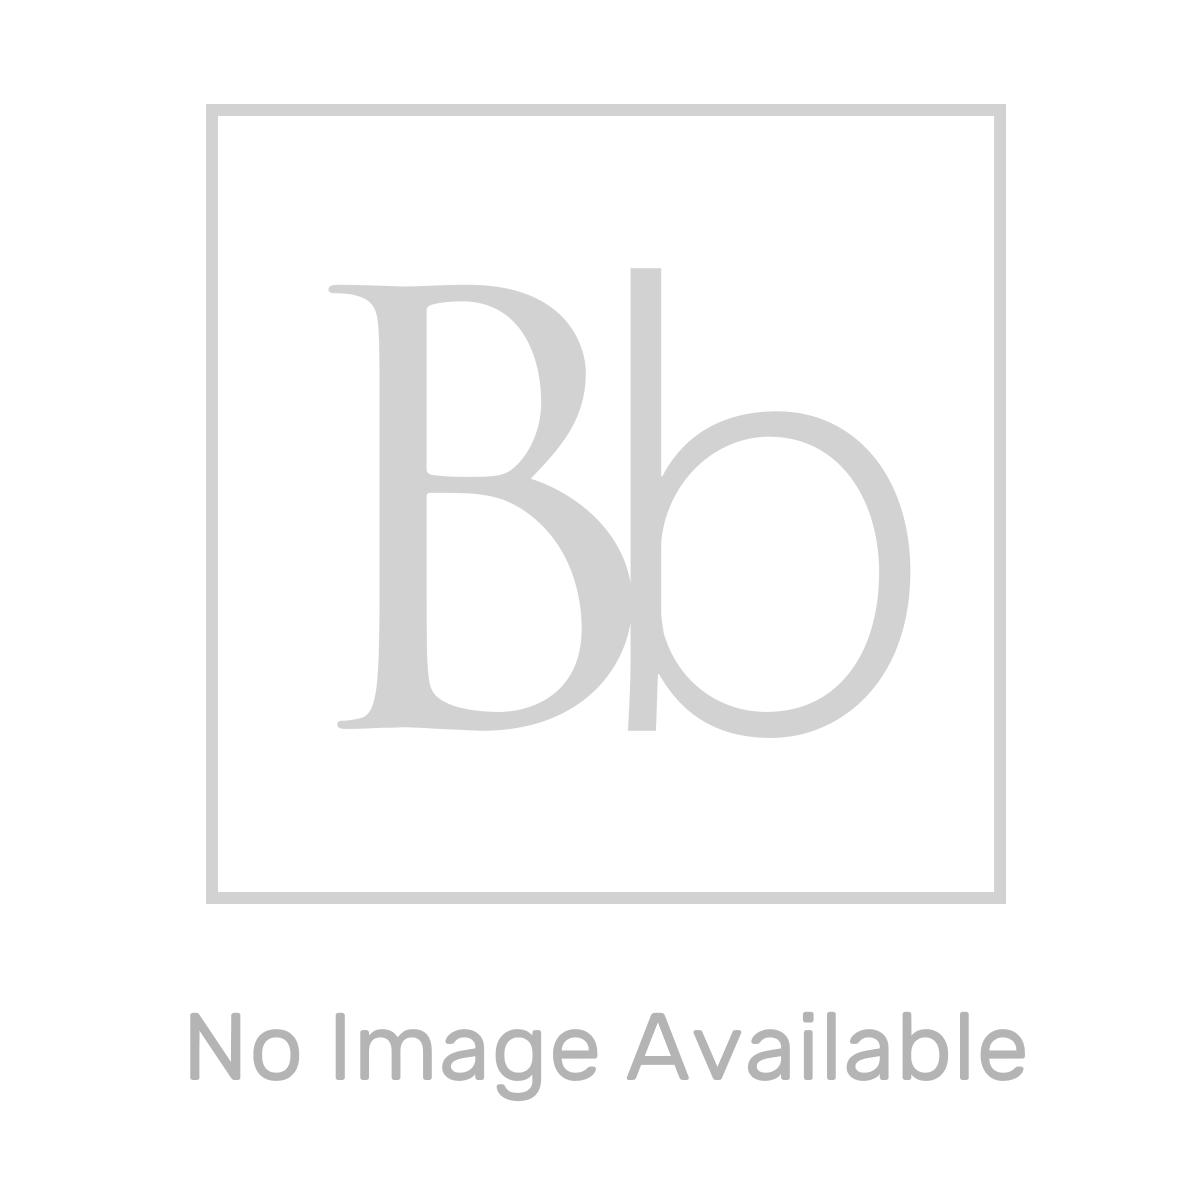 Aquadart White Slate Shower Tray 1700 x 900 Dimensions